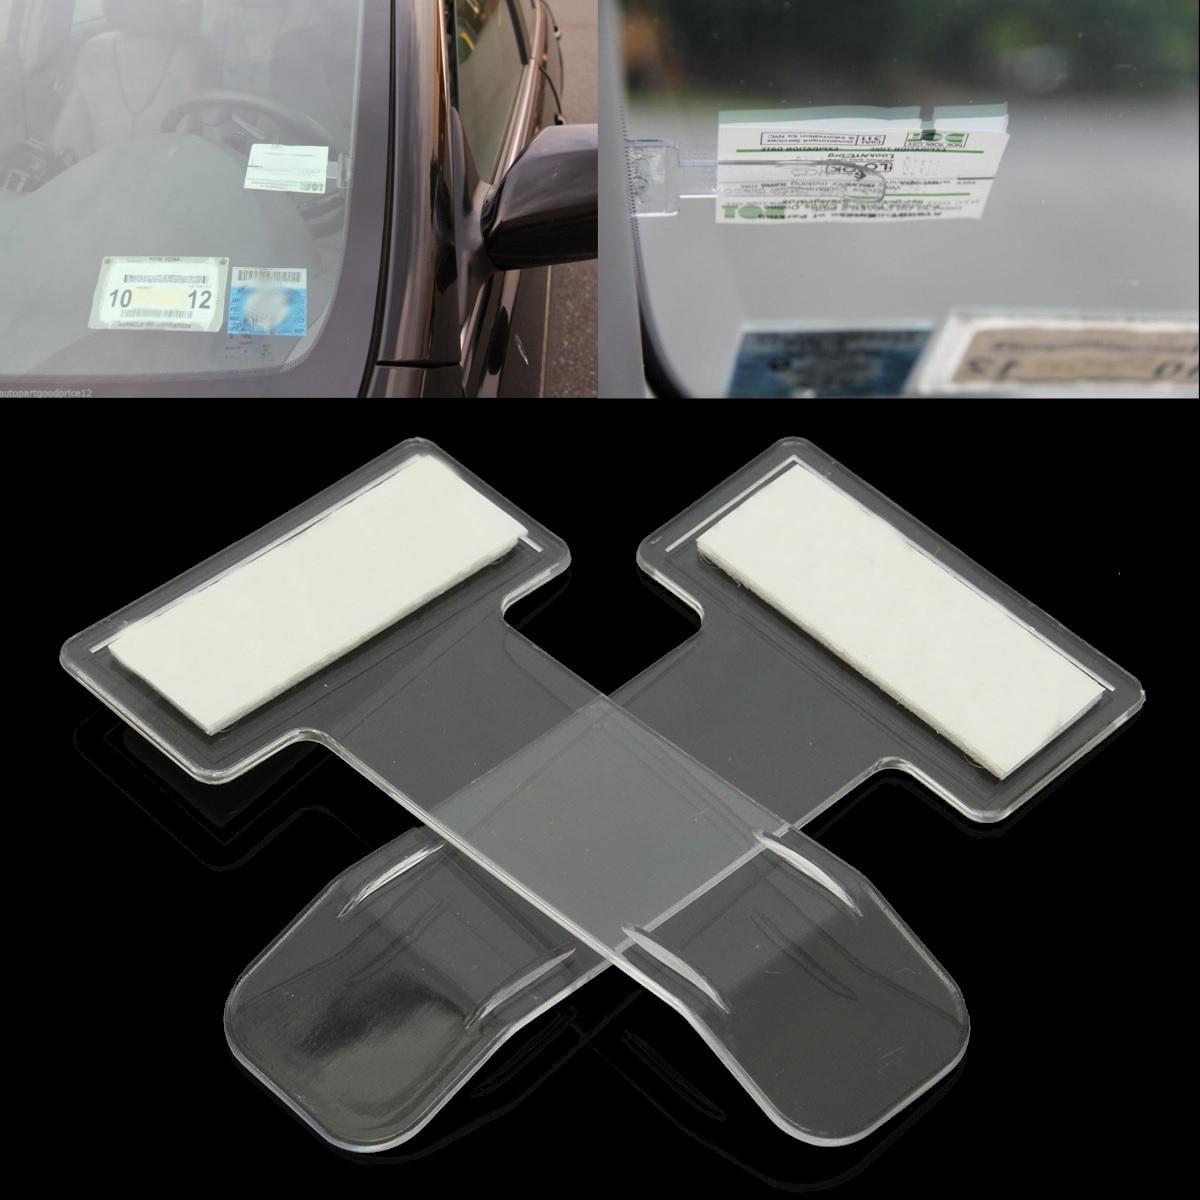 2pcs/set Car Vehicle Parking Ticket Permit Holder Clip Sticker Windscreen Window Fastener Stickers Kit Car Styling Accessories